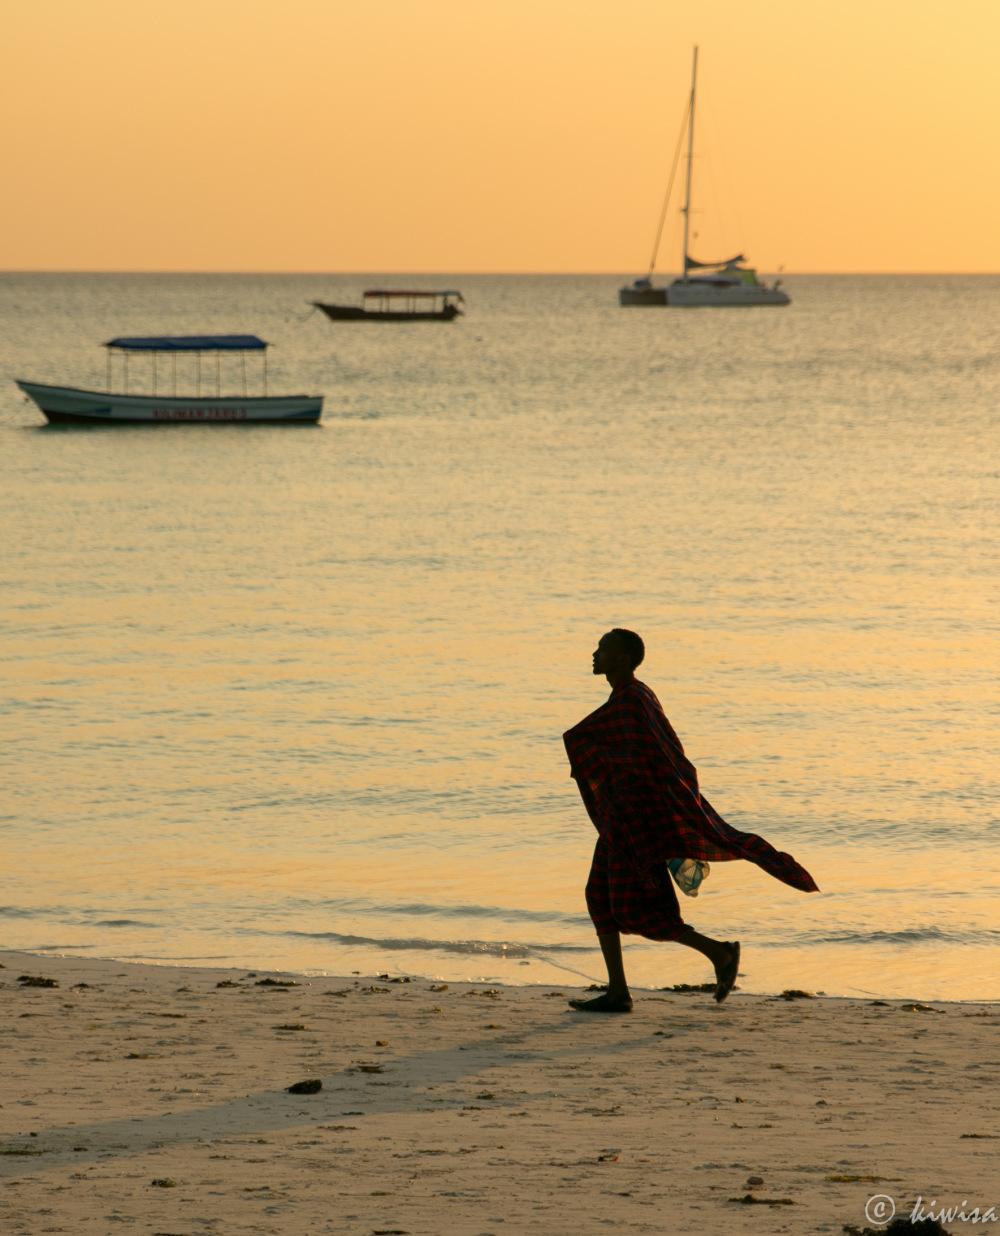 #22 Zanzibar- Silhouette against the sunset